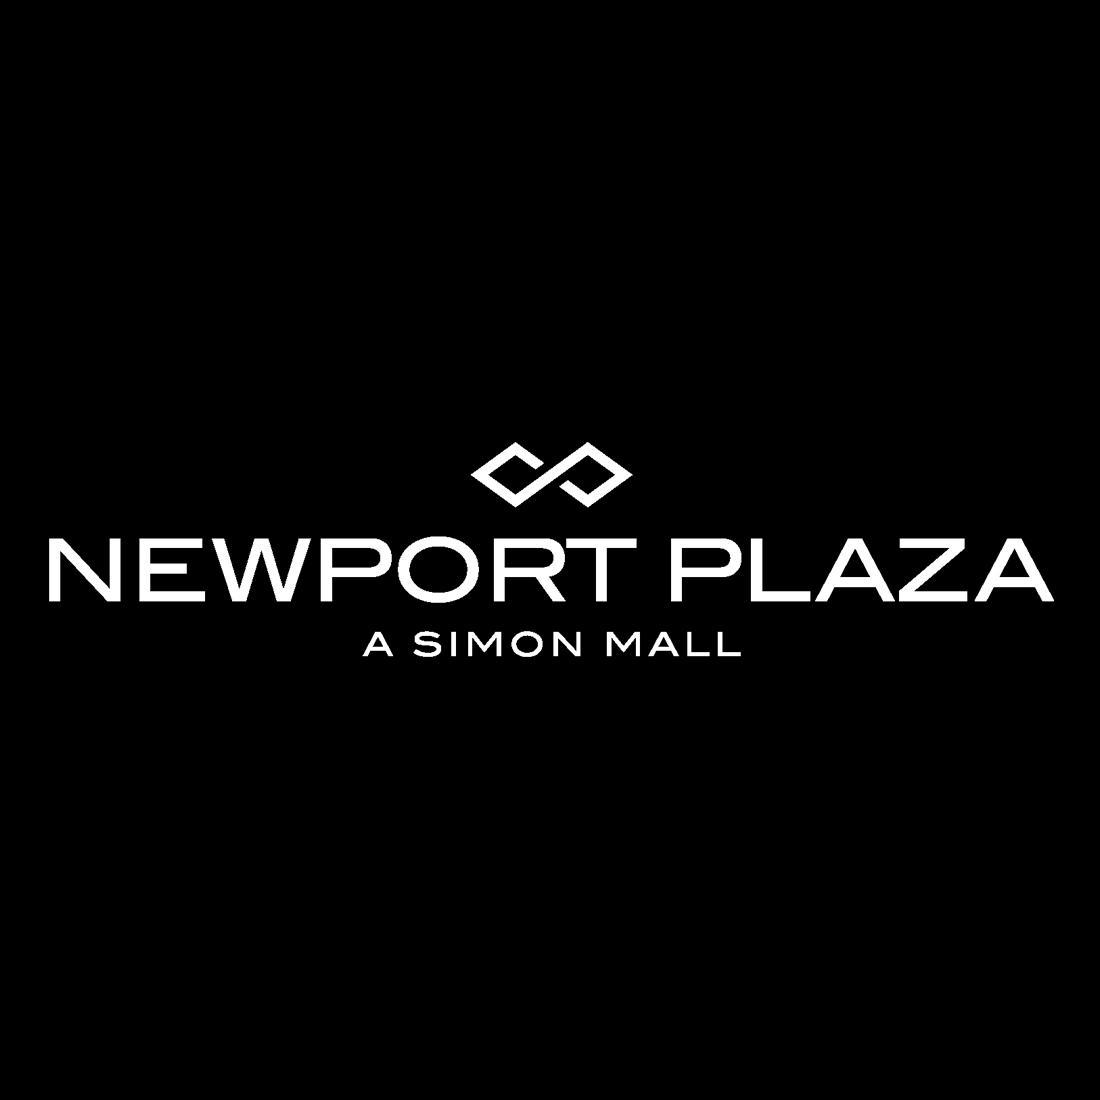 Newport Plaza